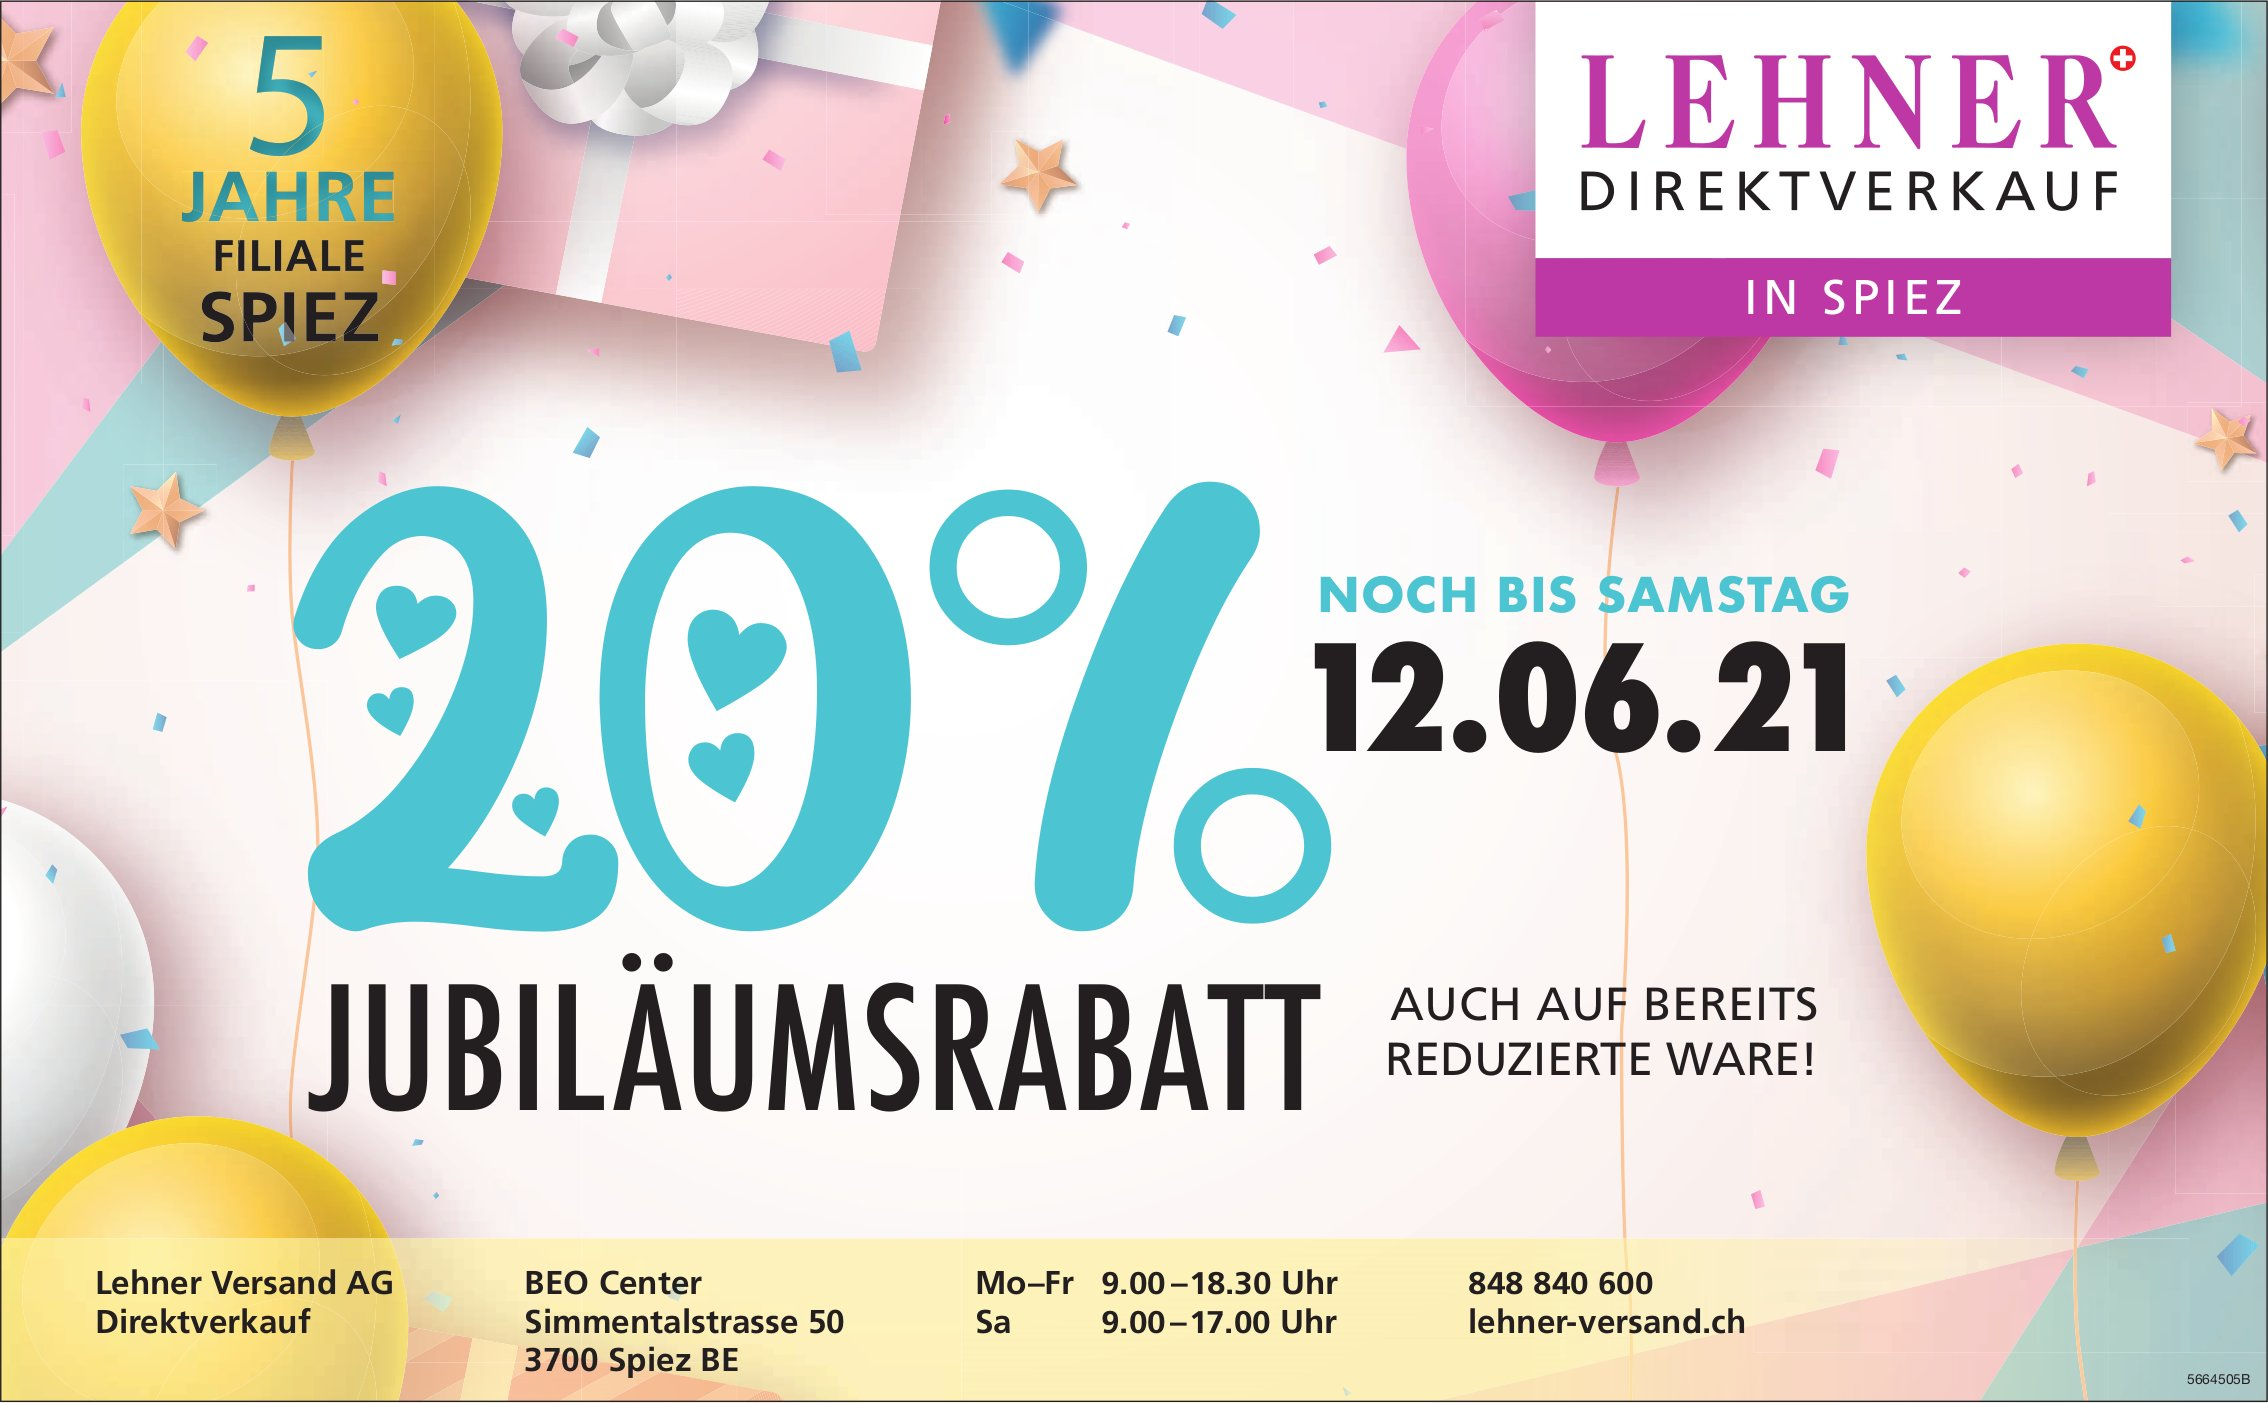 Lehner Versand AG, Spiez BE - 20% Jubiläumsrabatt bis 12. Juni